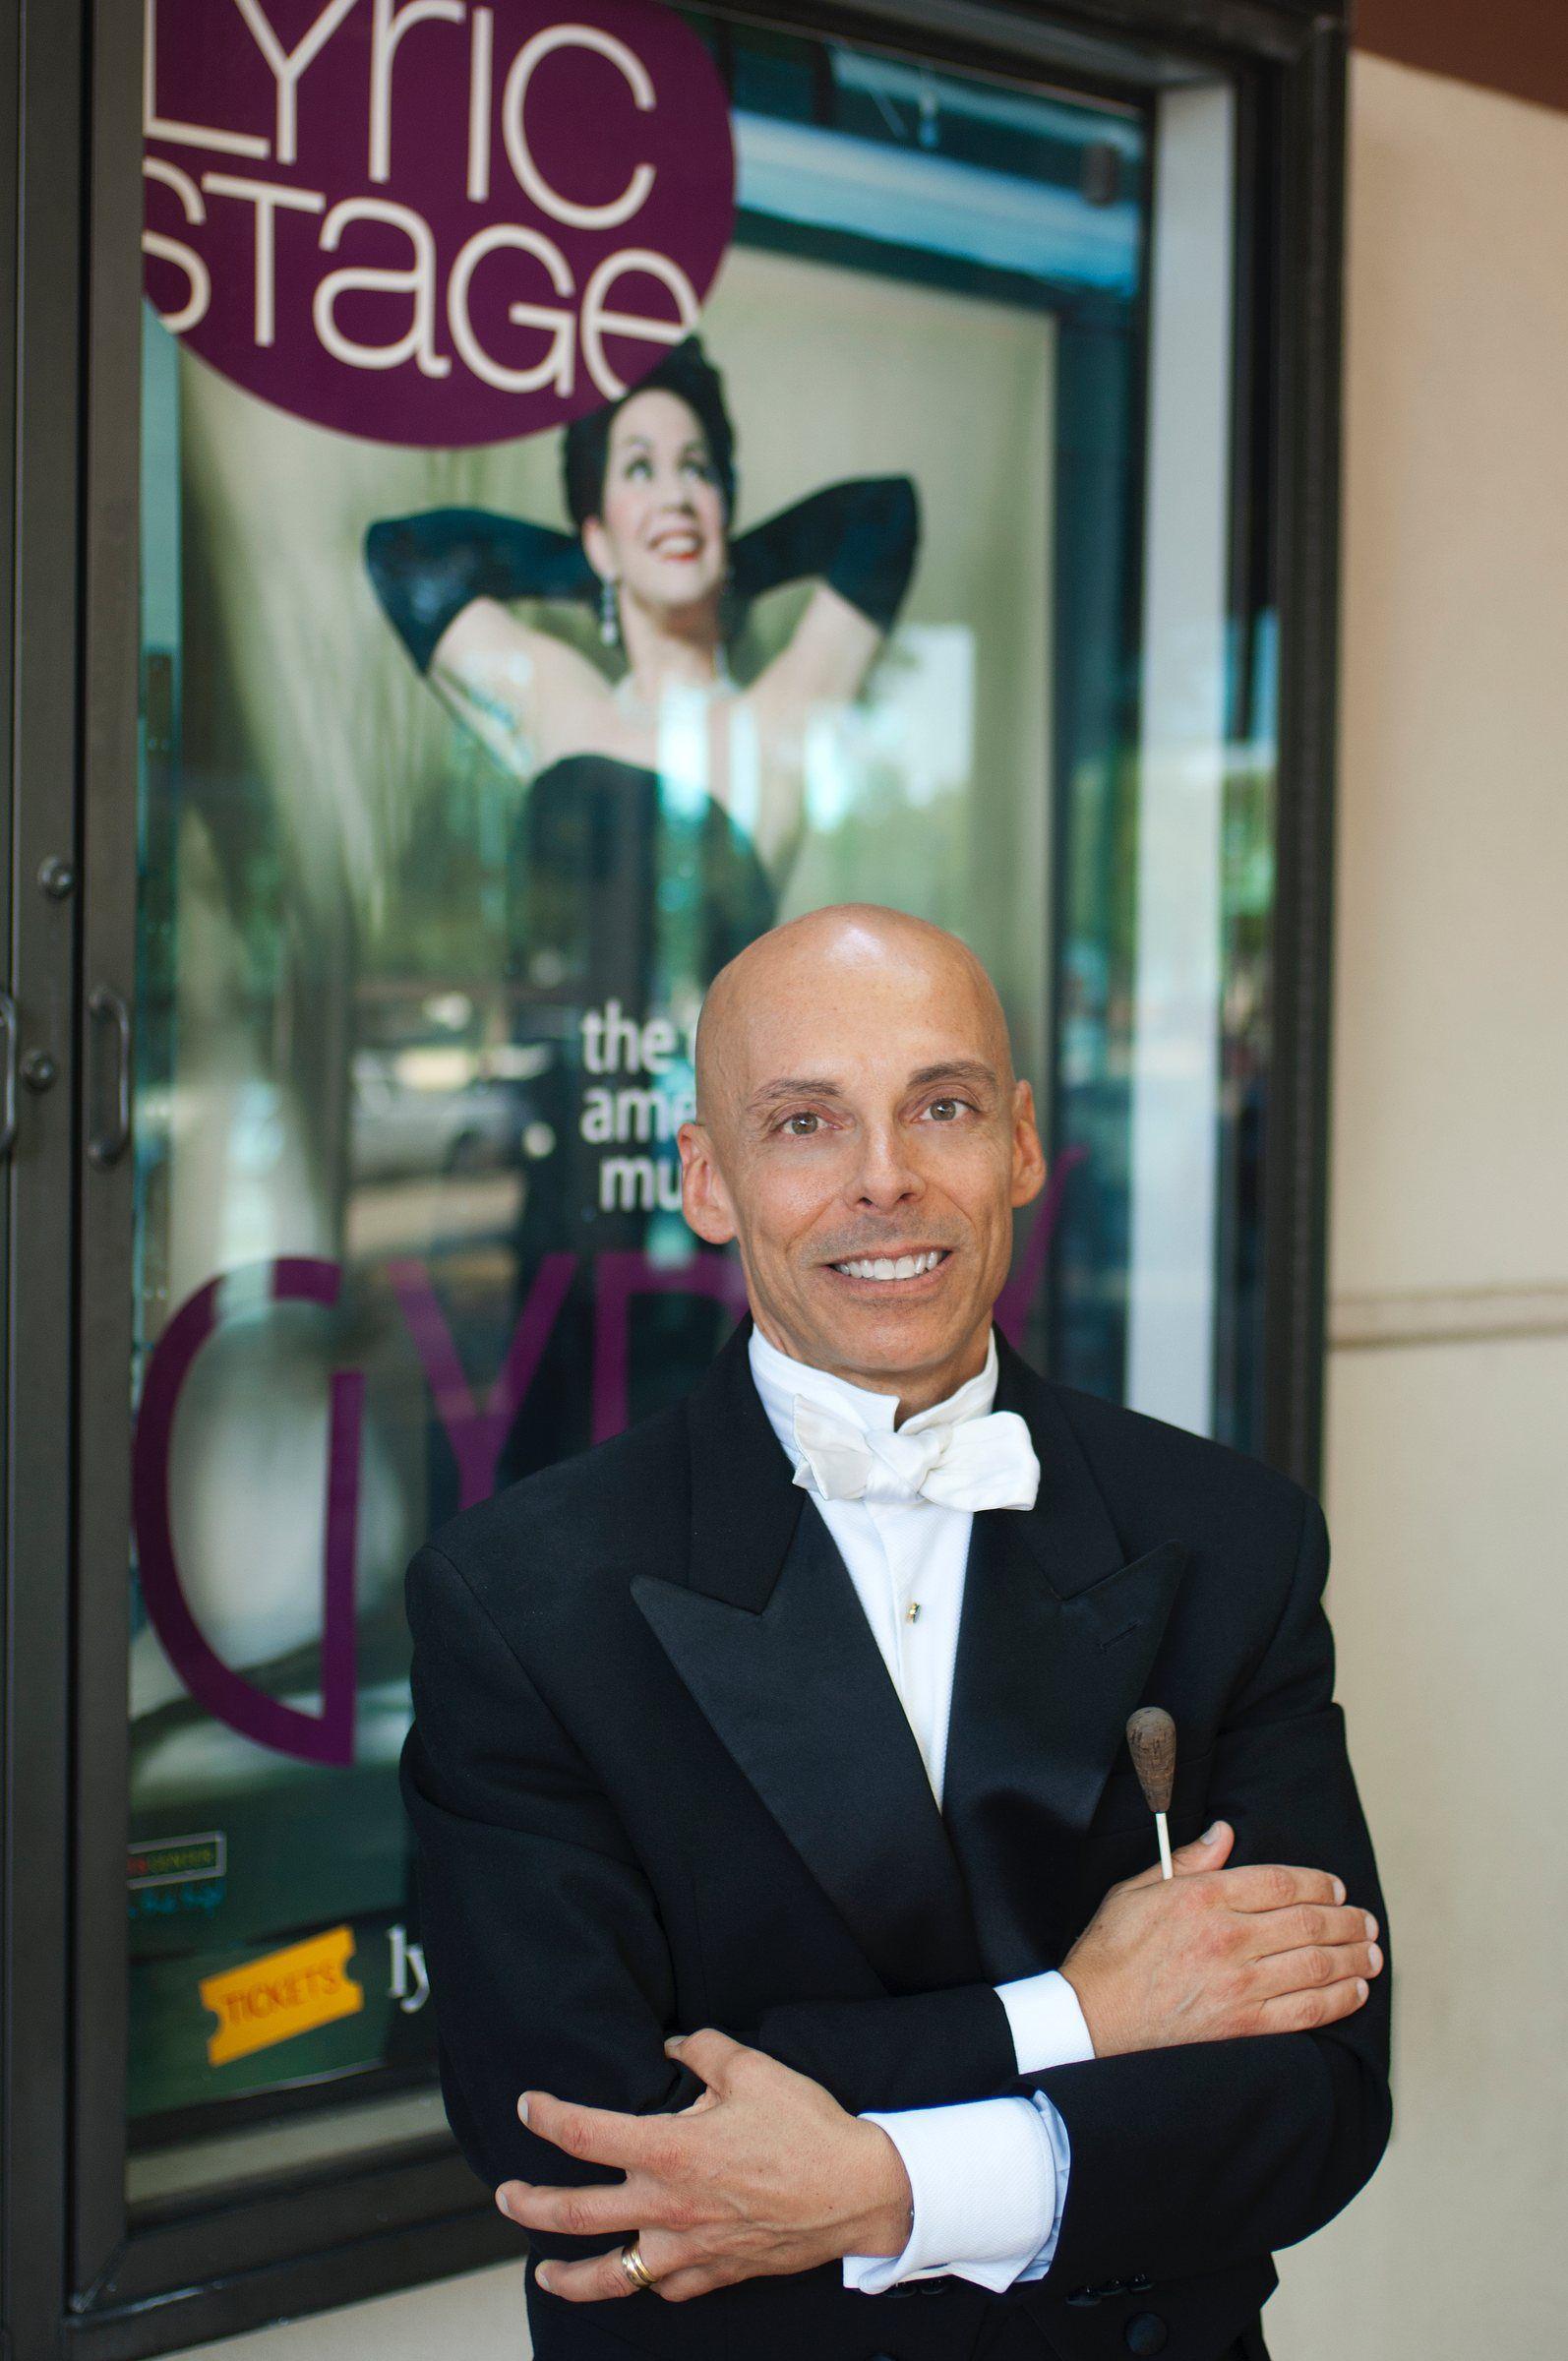 Jay Dias. Photo by Robert W. Hart.